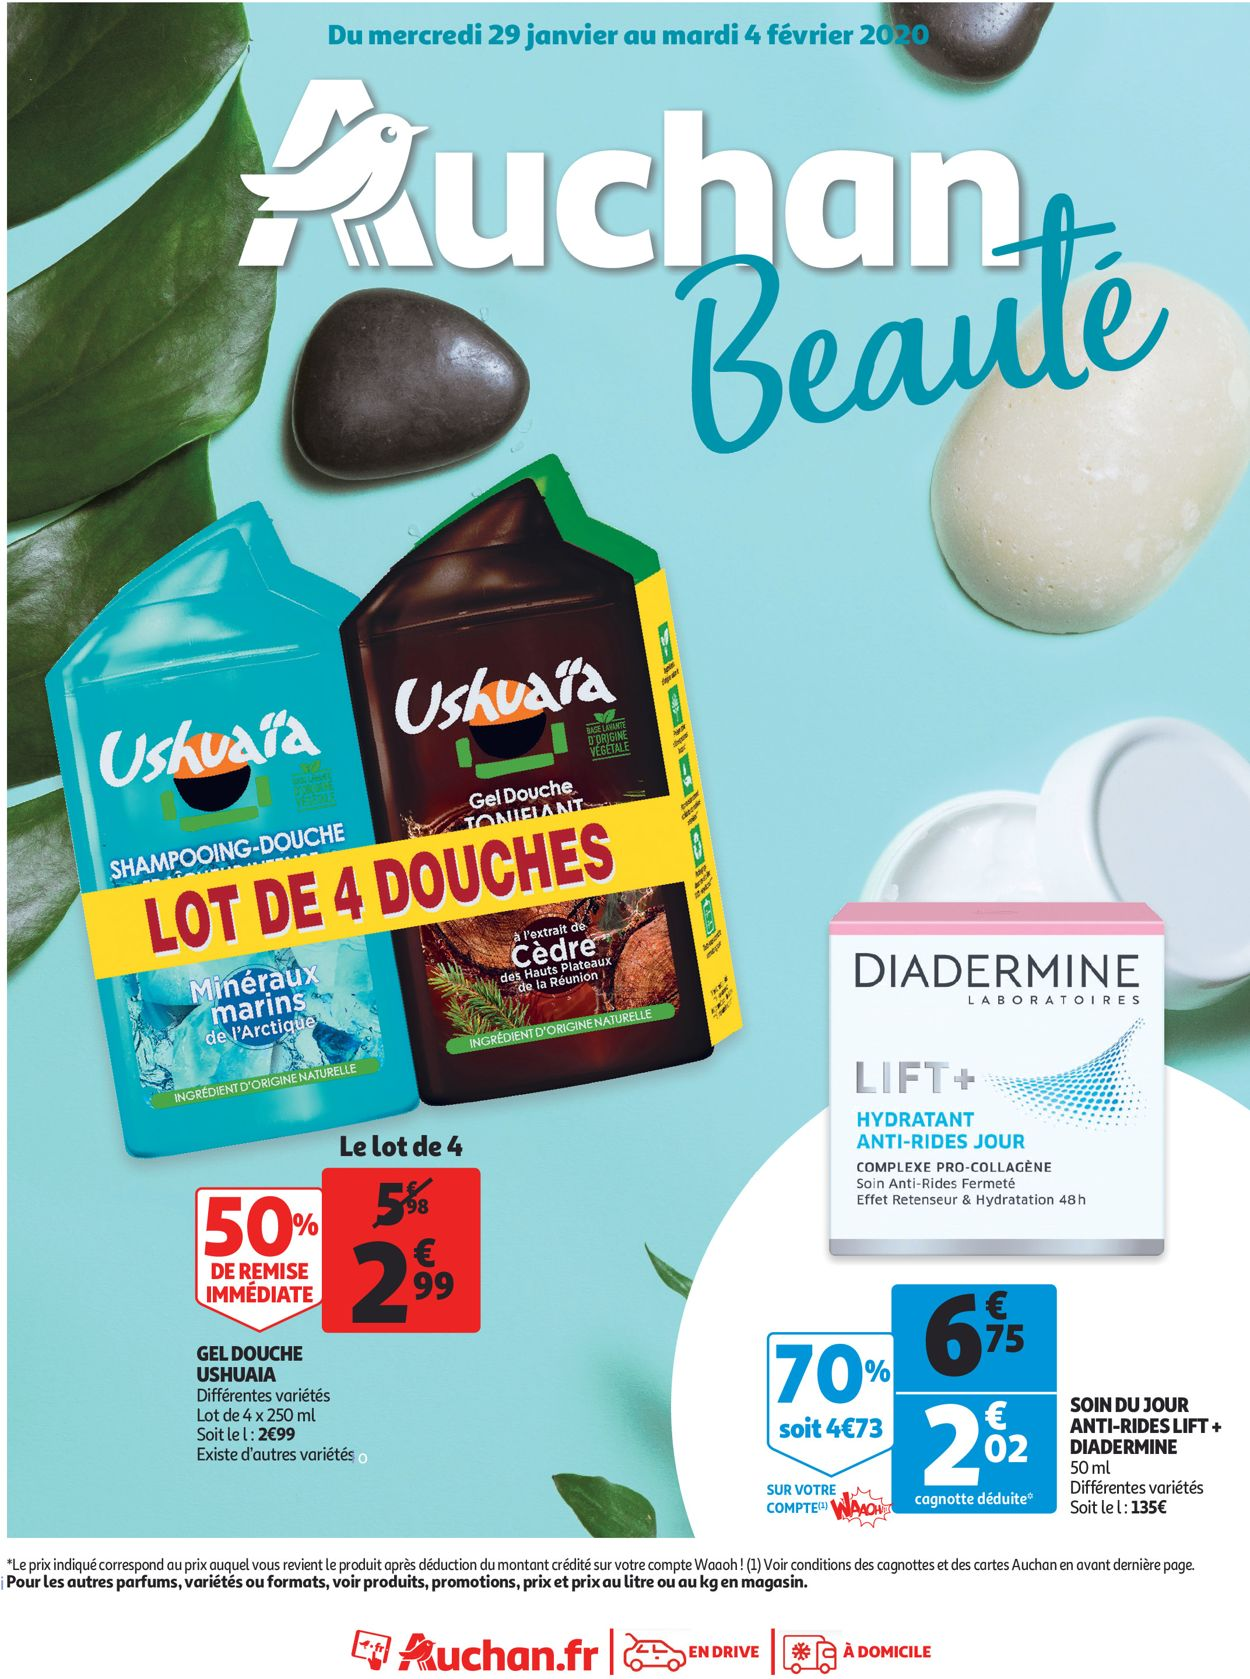 Auchan Catalogue - 29.01-04.02.2020